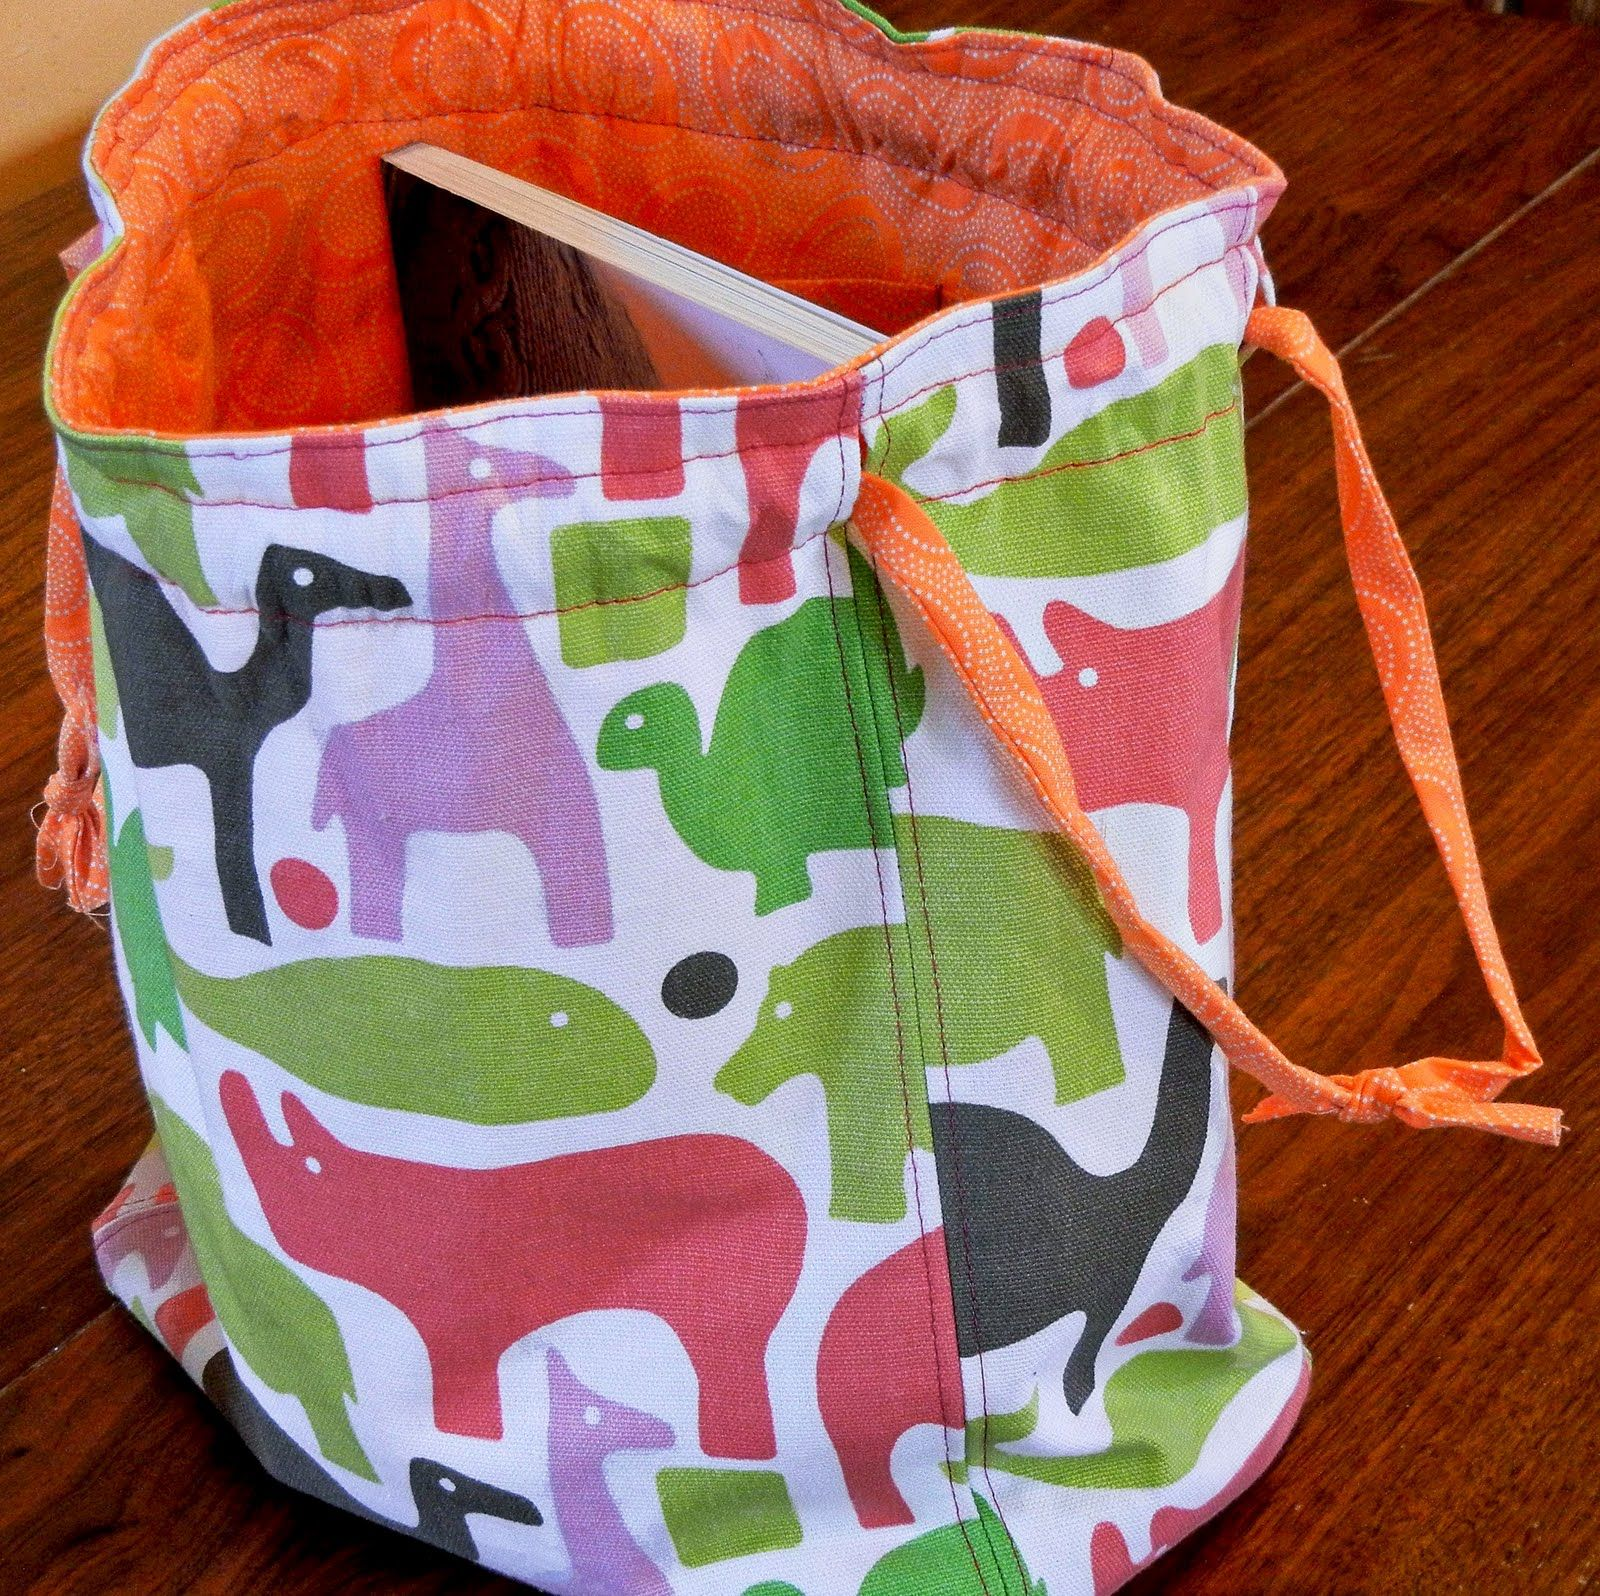 Knitting Bag Sewing Pattern Free : Knitting bag i like the design but would make regular